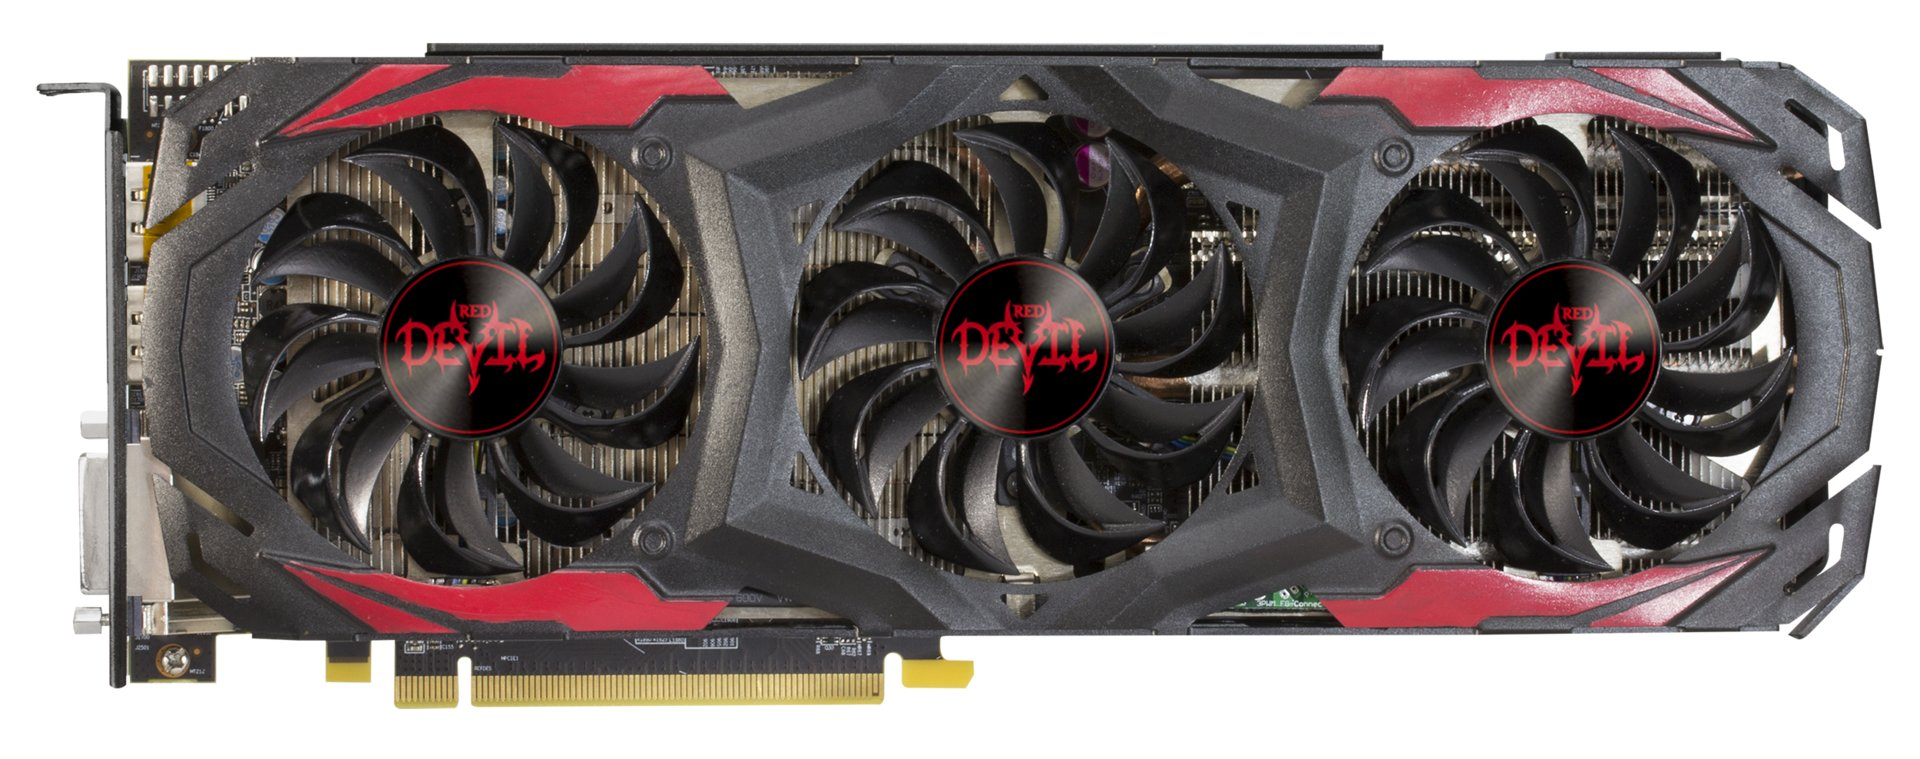 PowerColor Red Devil Radeon RX 480